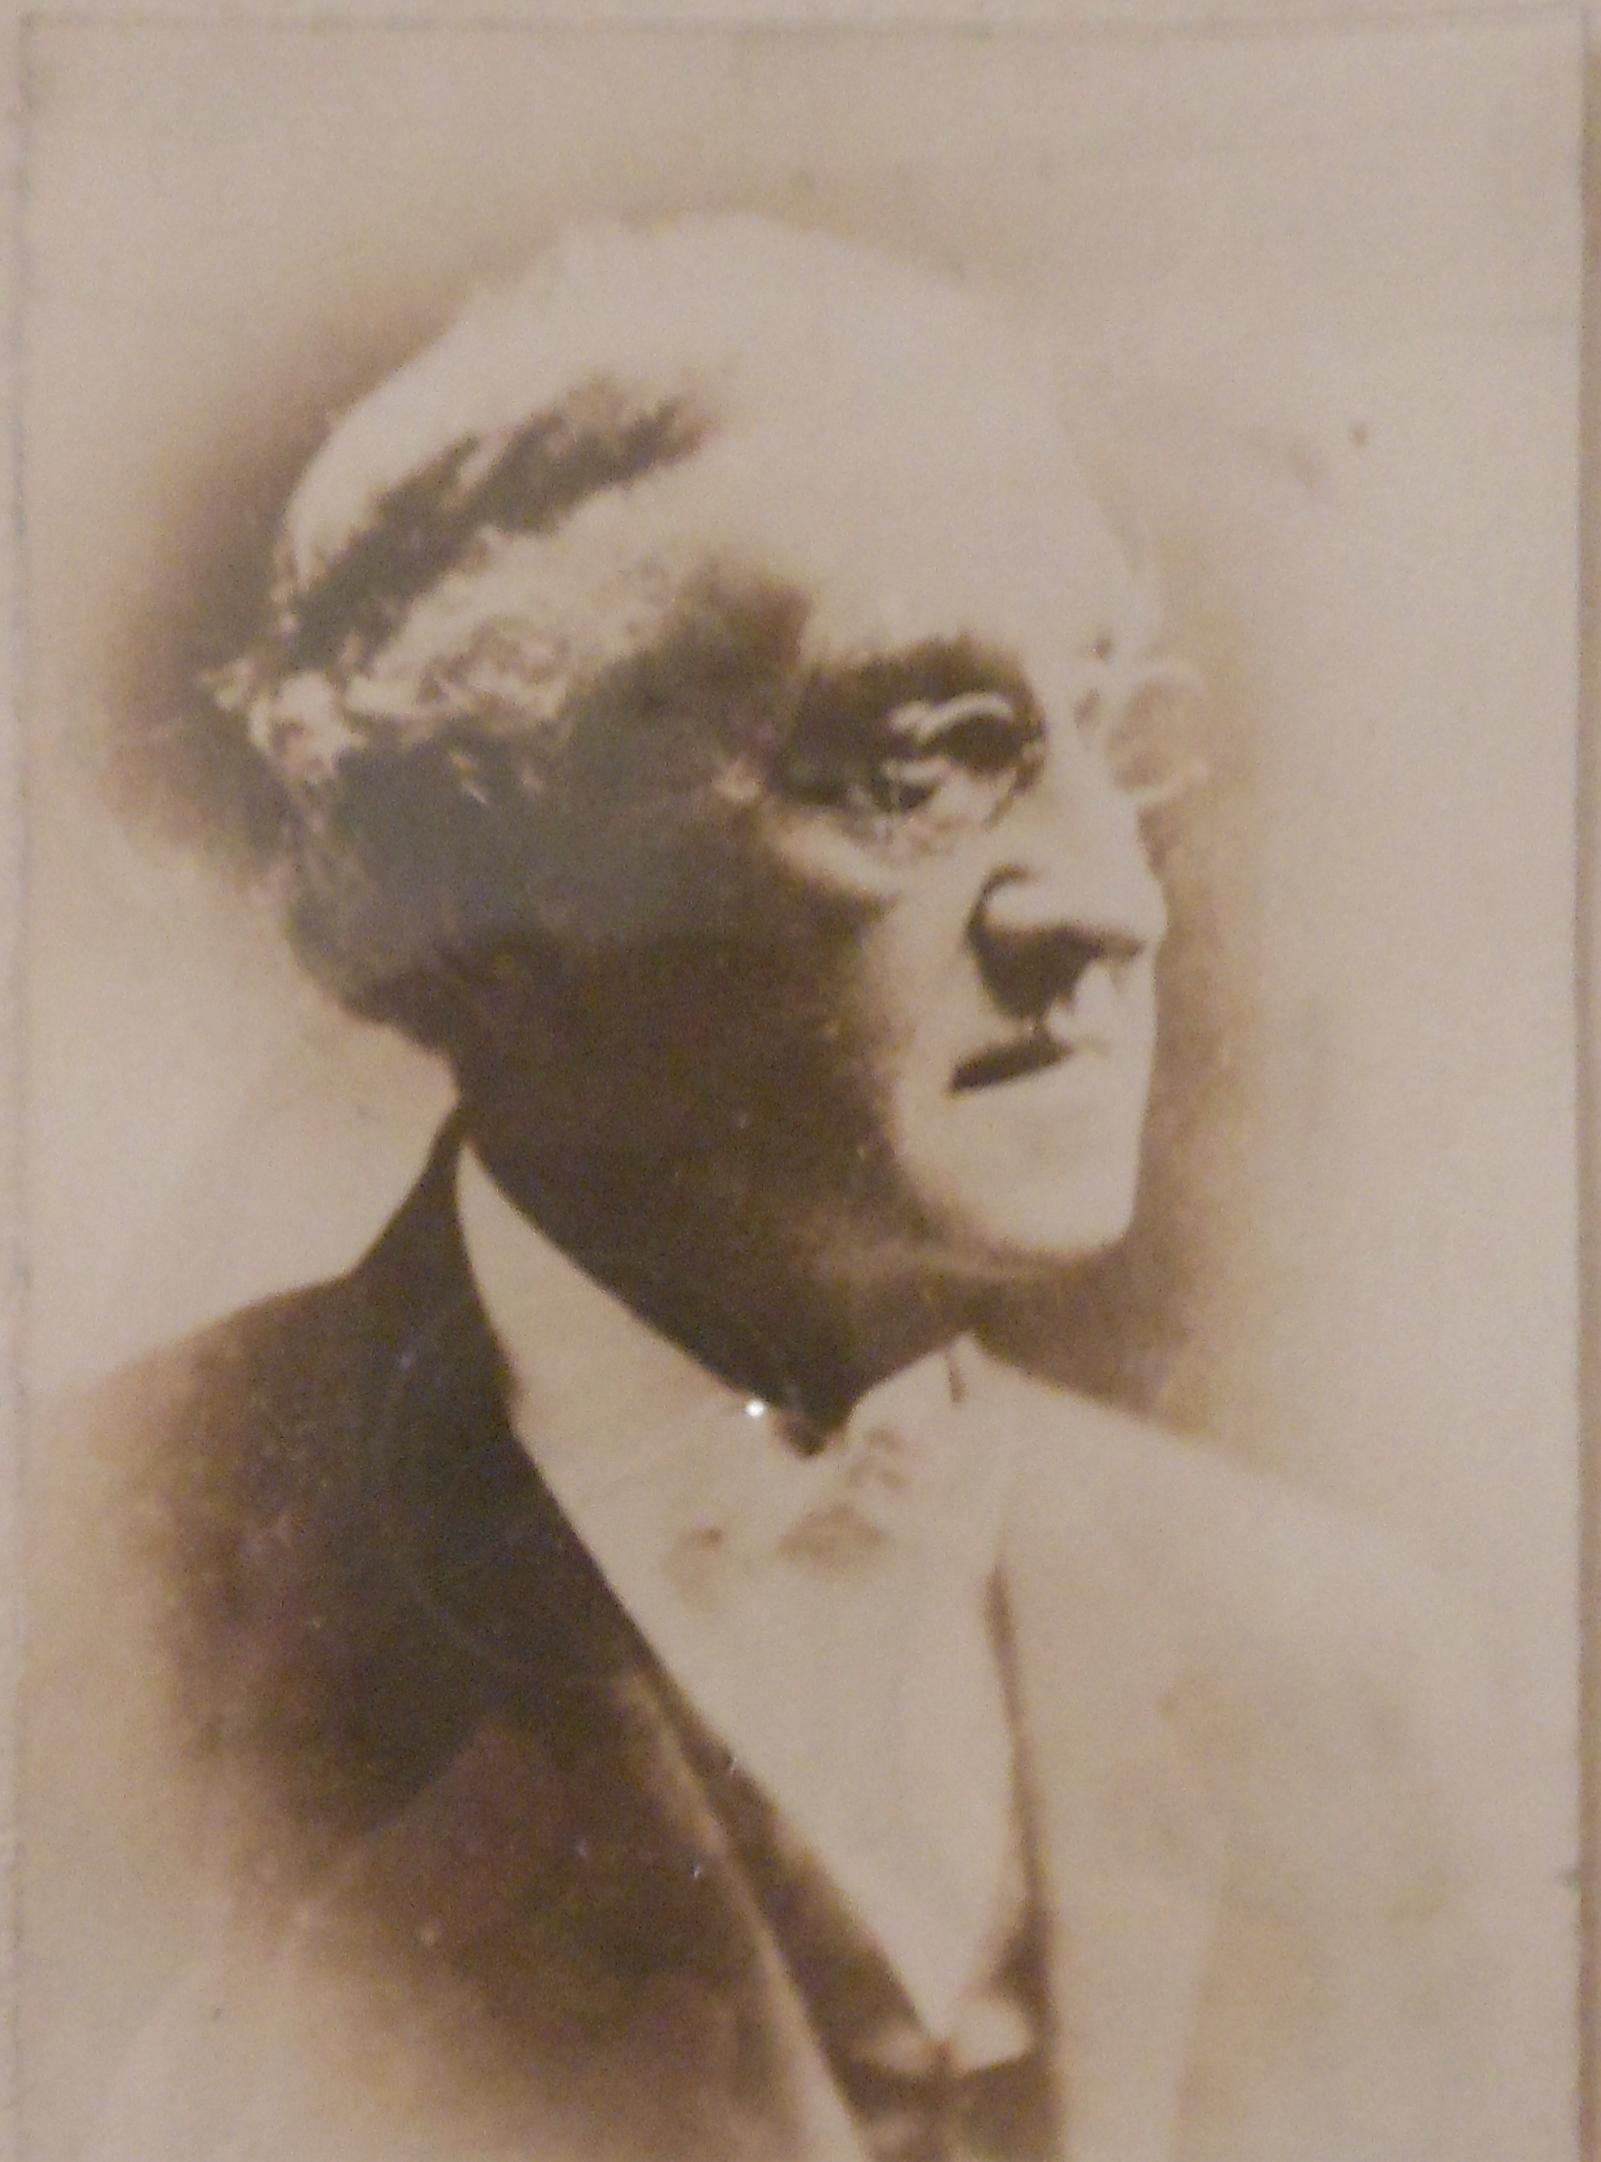 Josie Bogle